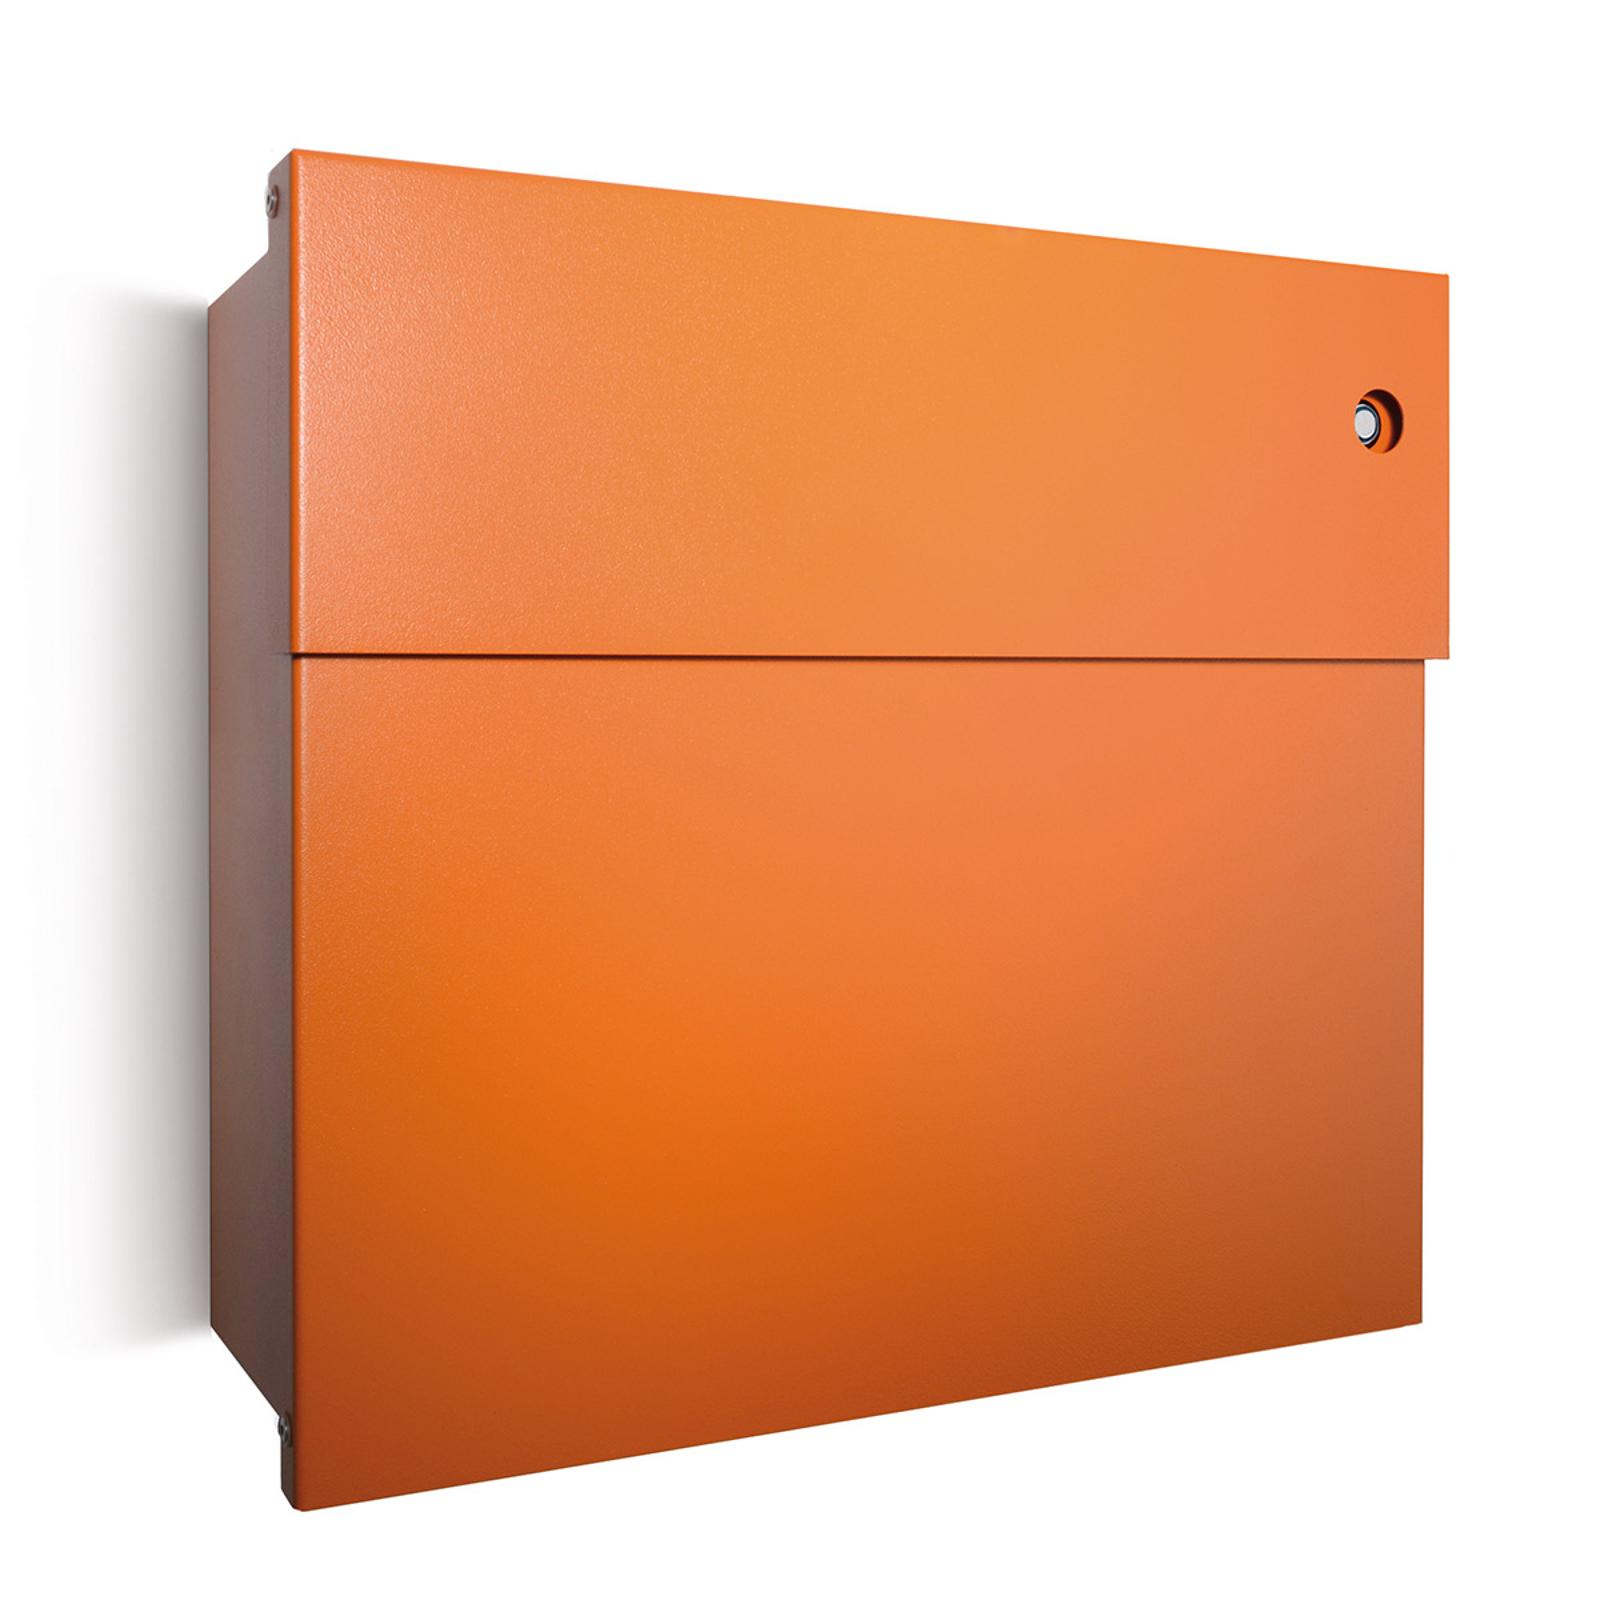 Boîte lettres Letterman IV, sonnette bleue, orange